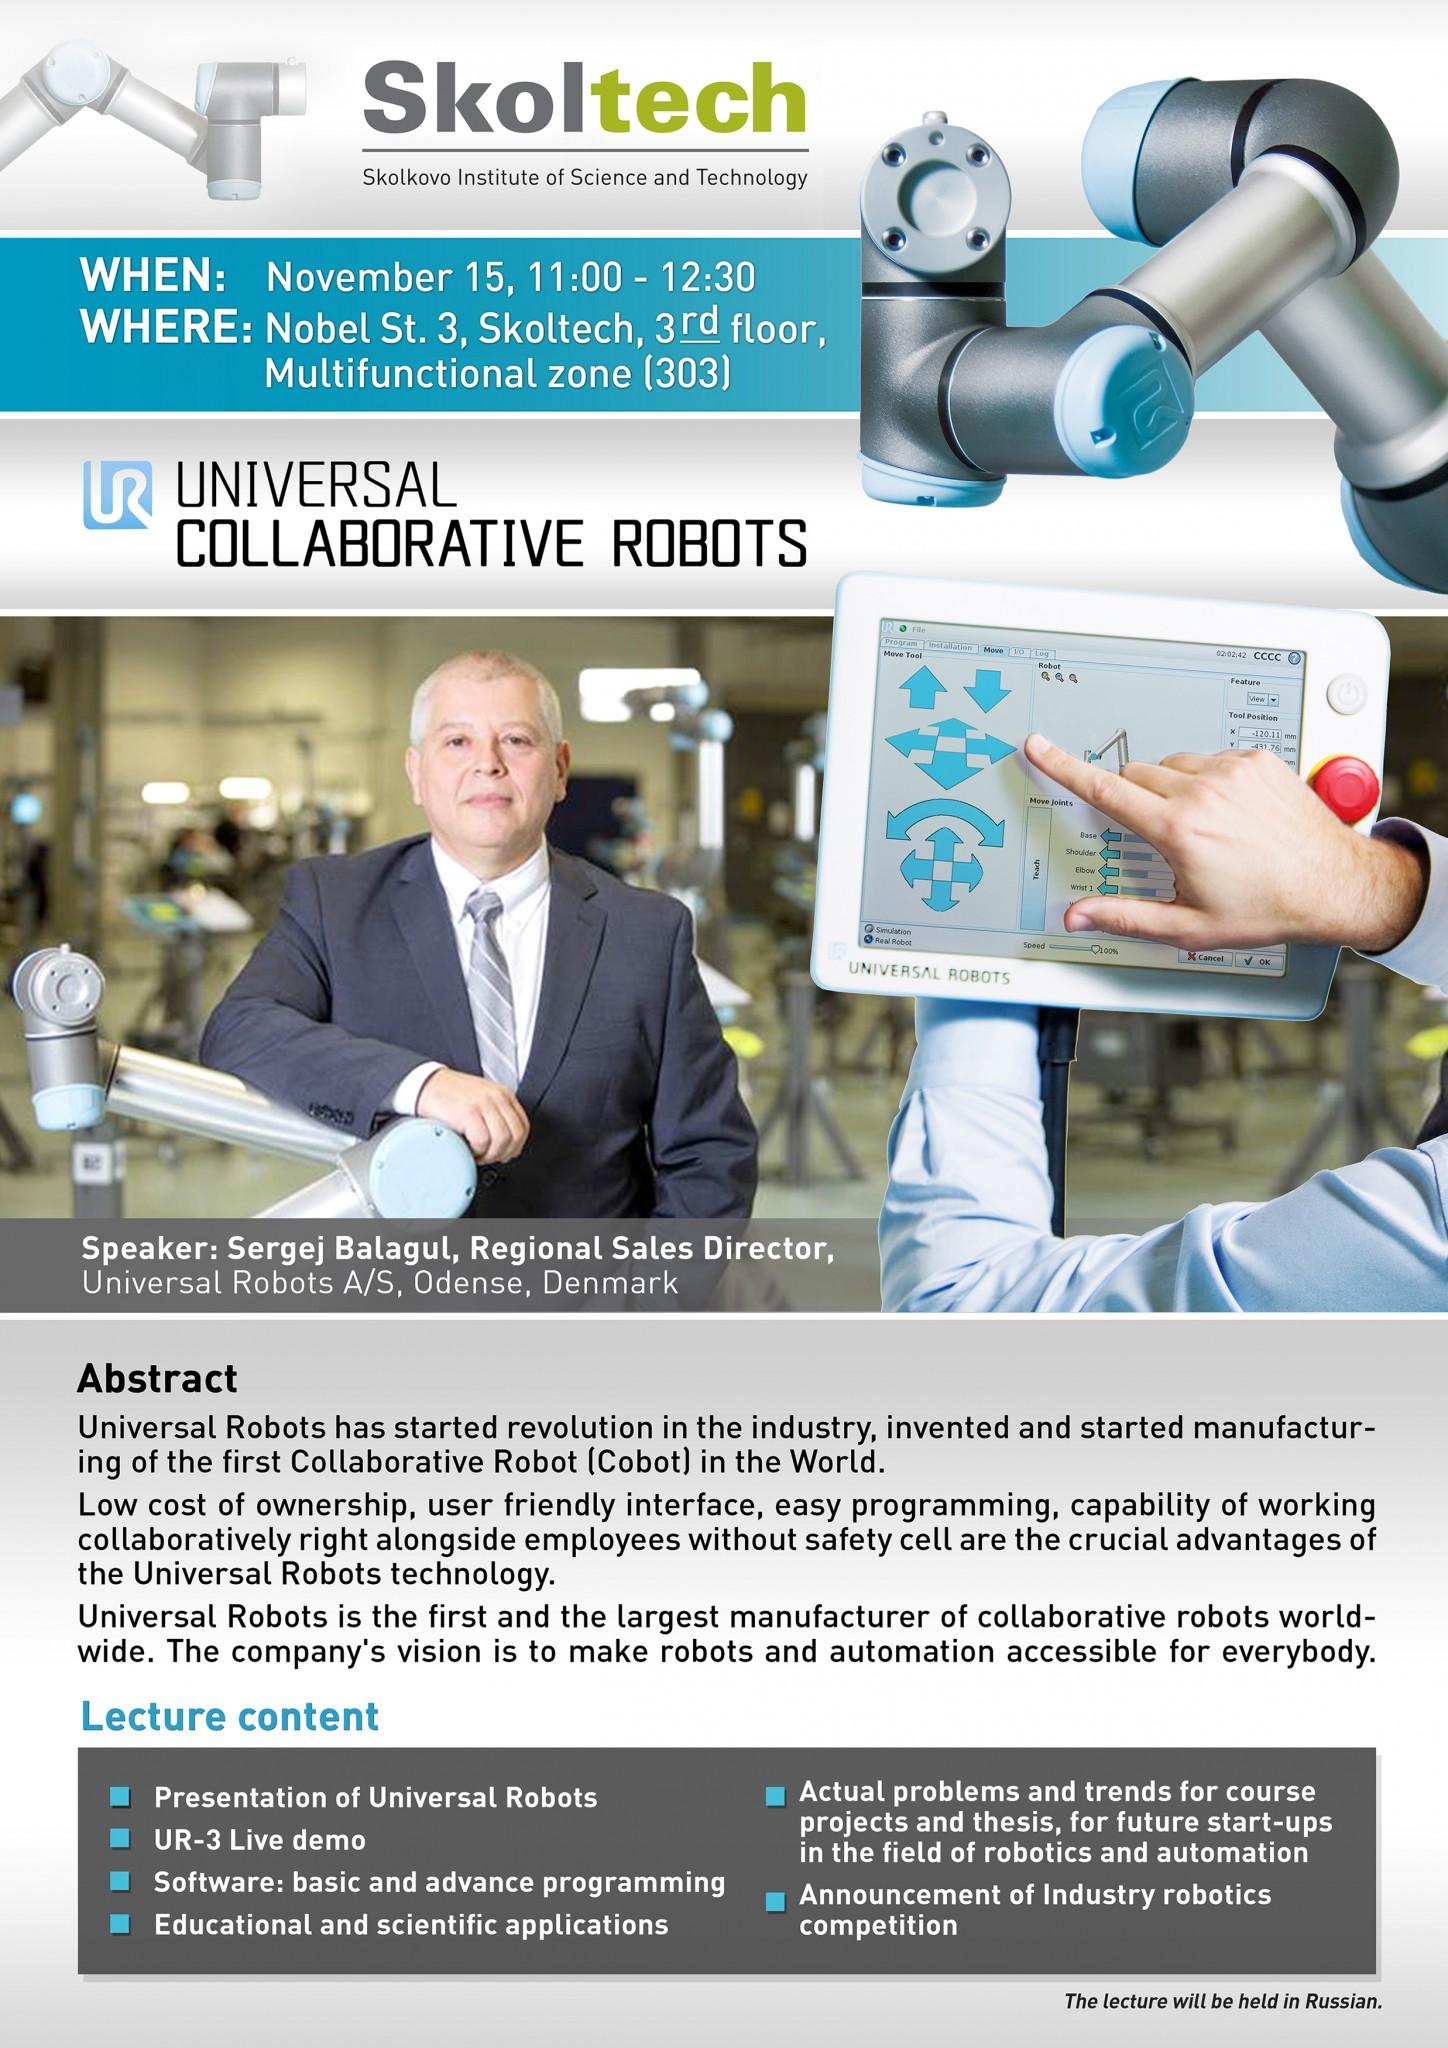 Skoltech | Presentation of Universal Robots